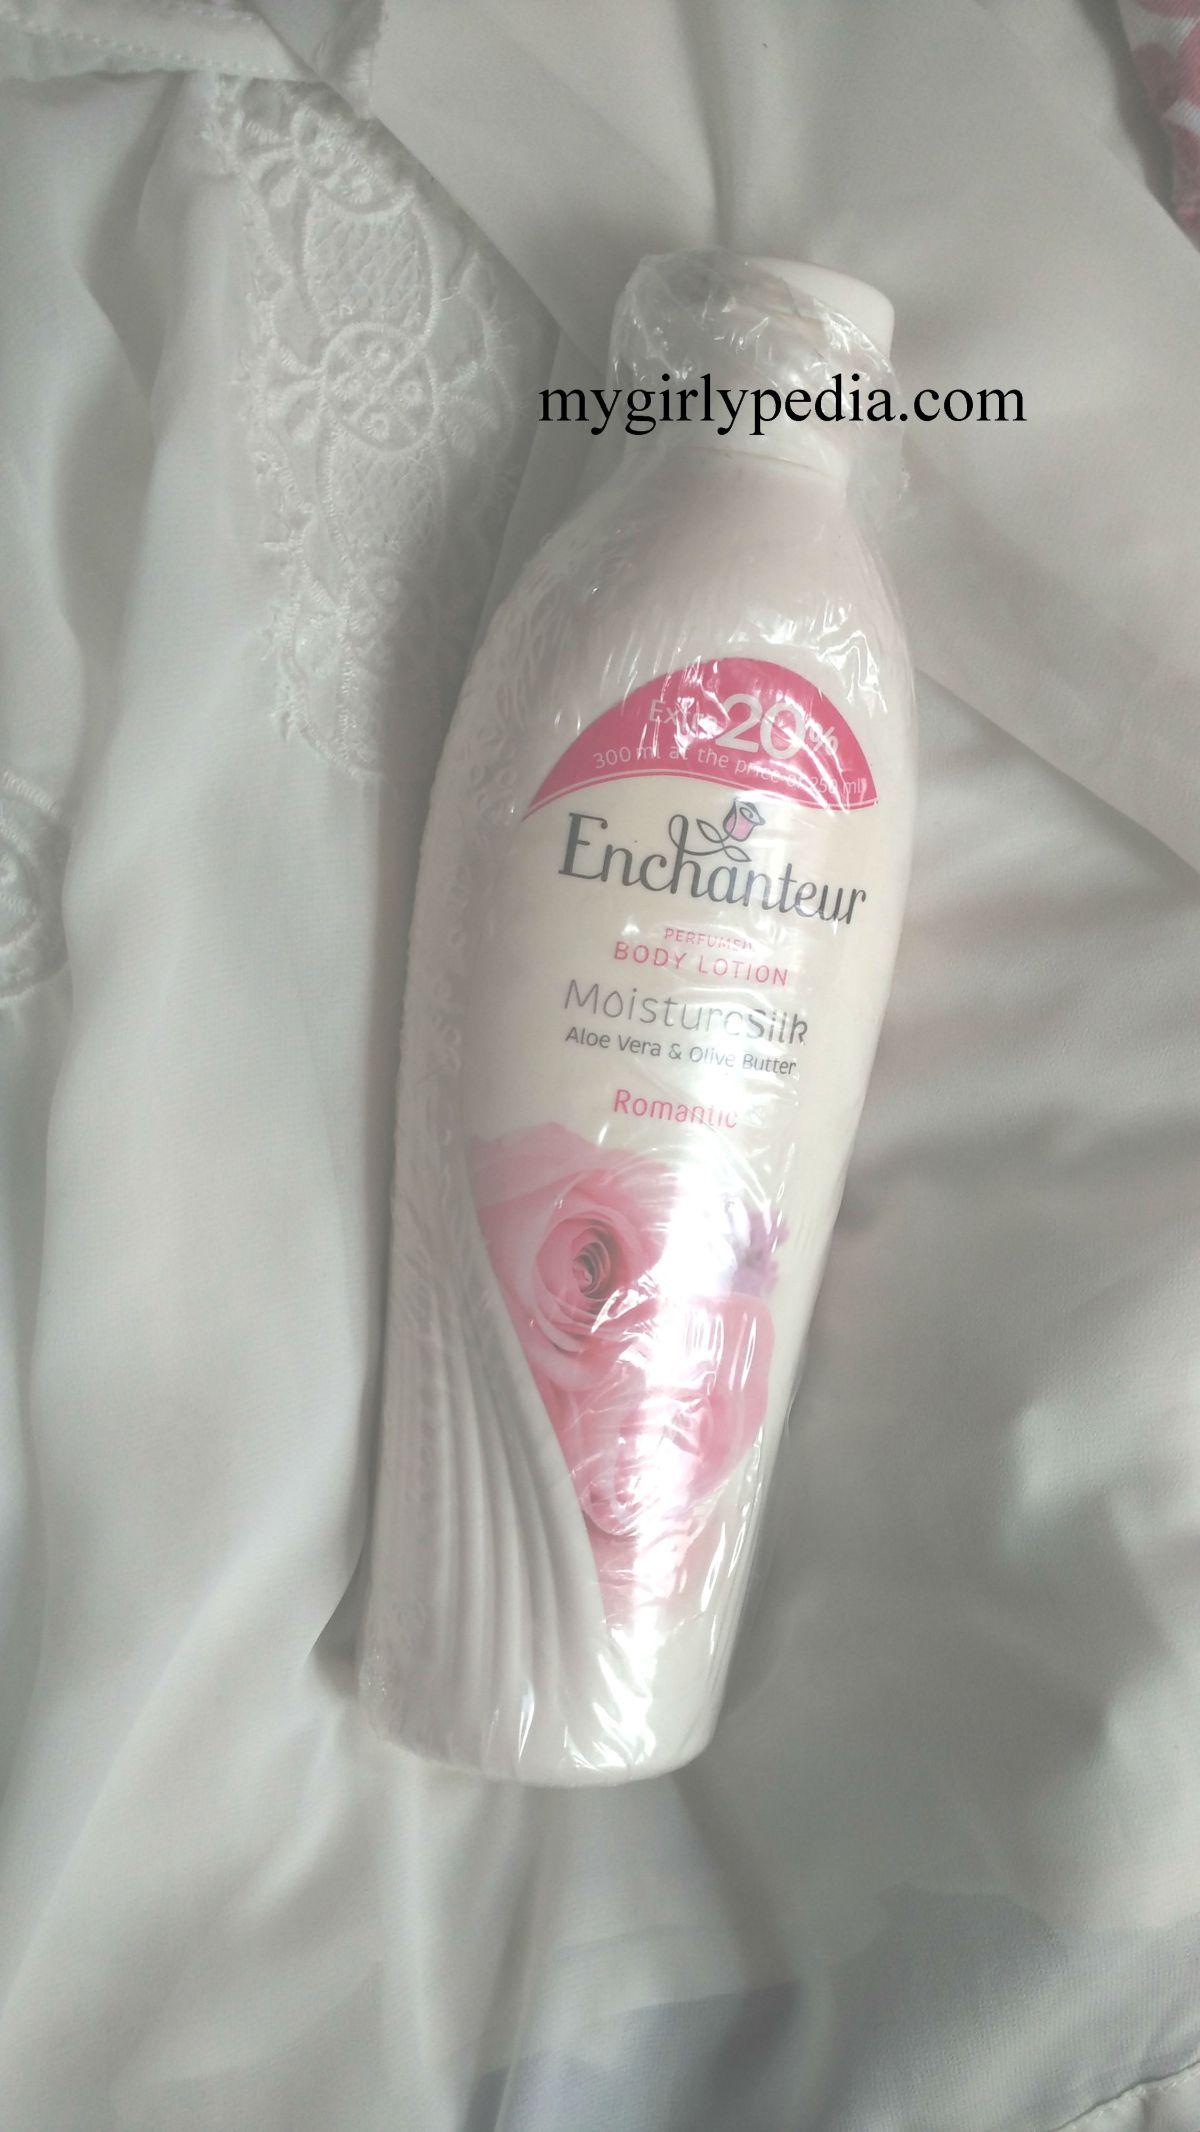 Enchanteur romantic body lotion, thumbs up or thumbsdown???